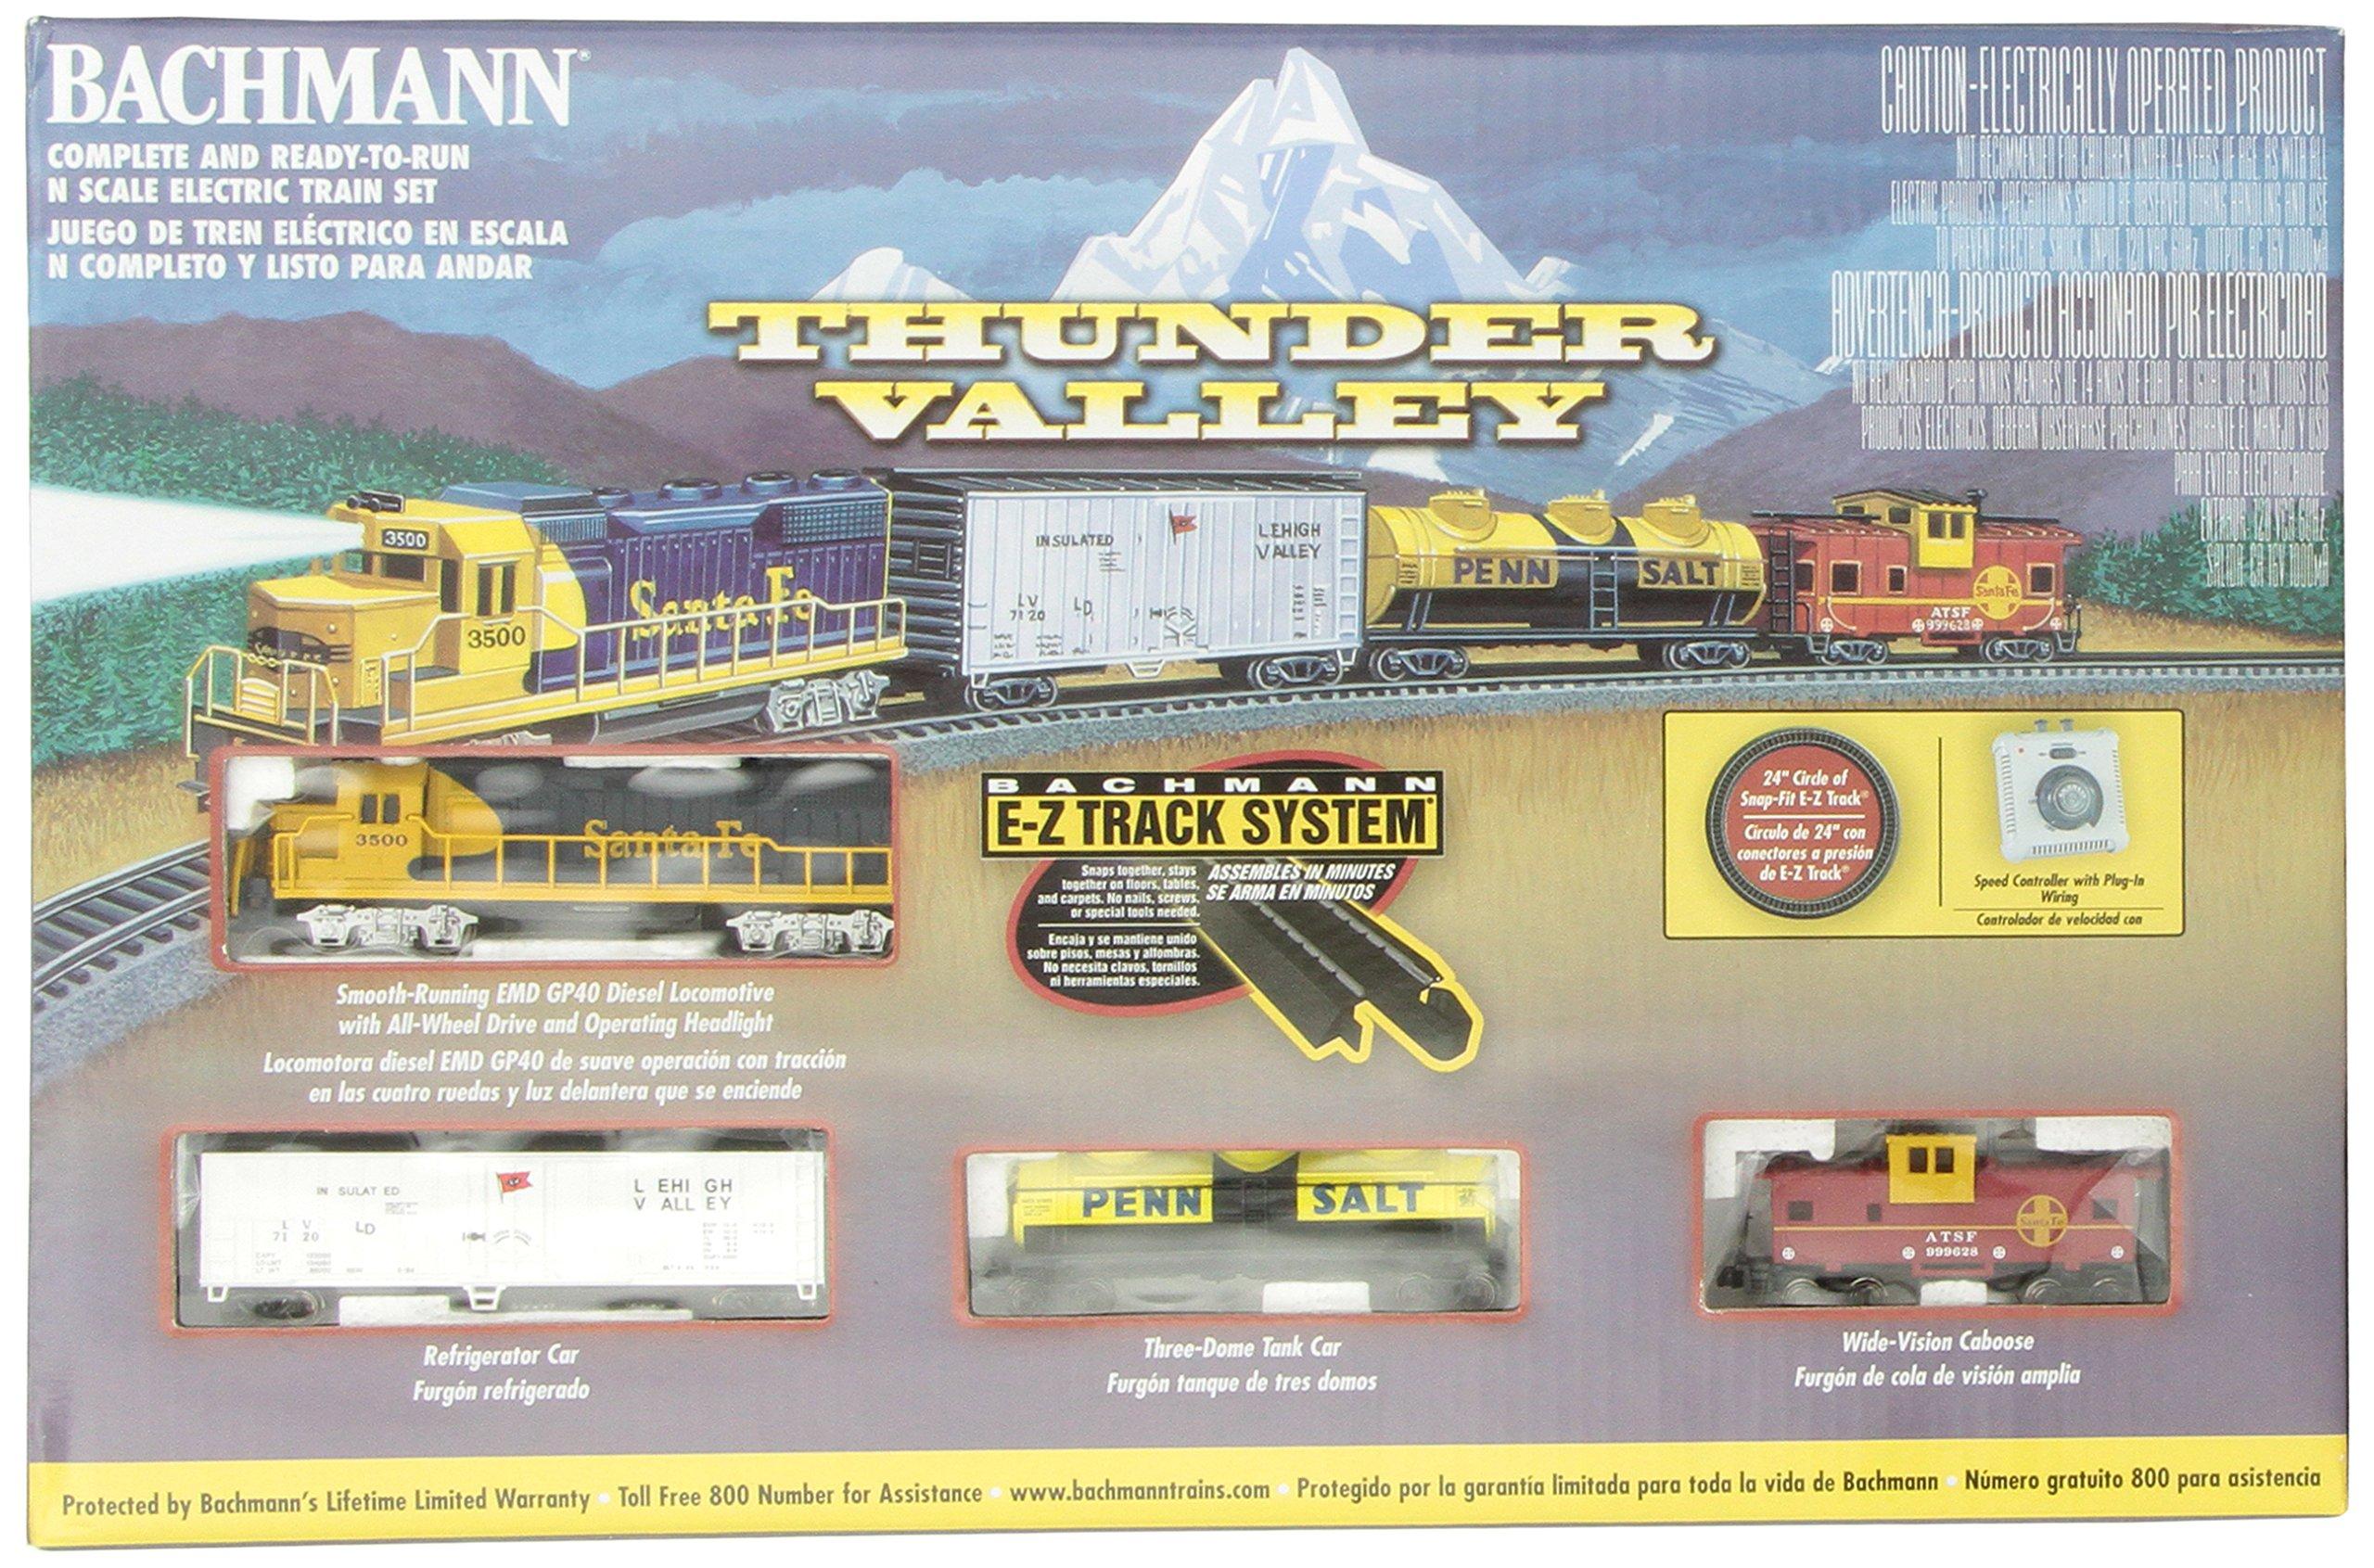 Bachmann Trains Thunder Valley Ready-to-Run N Scale Train Set